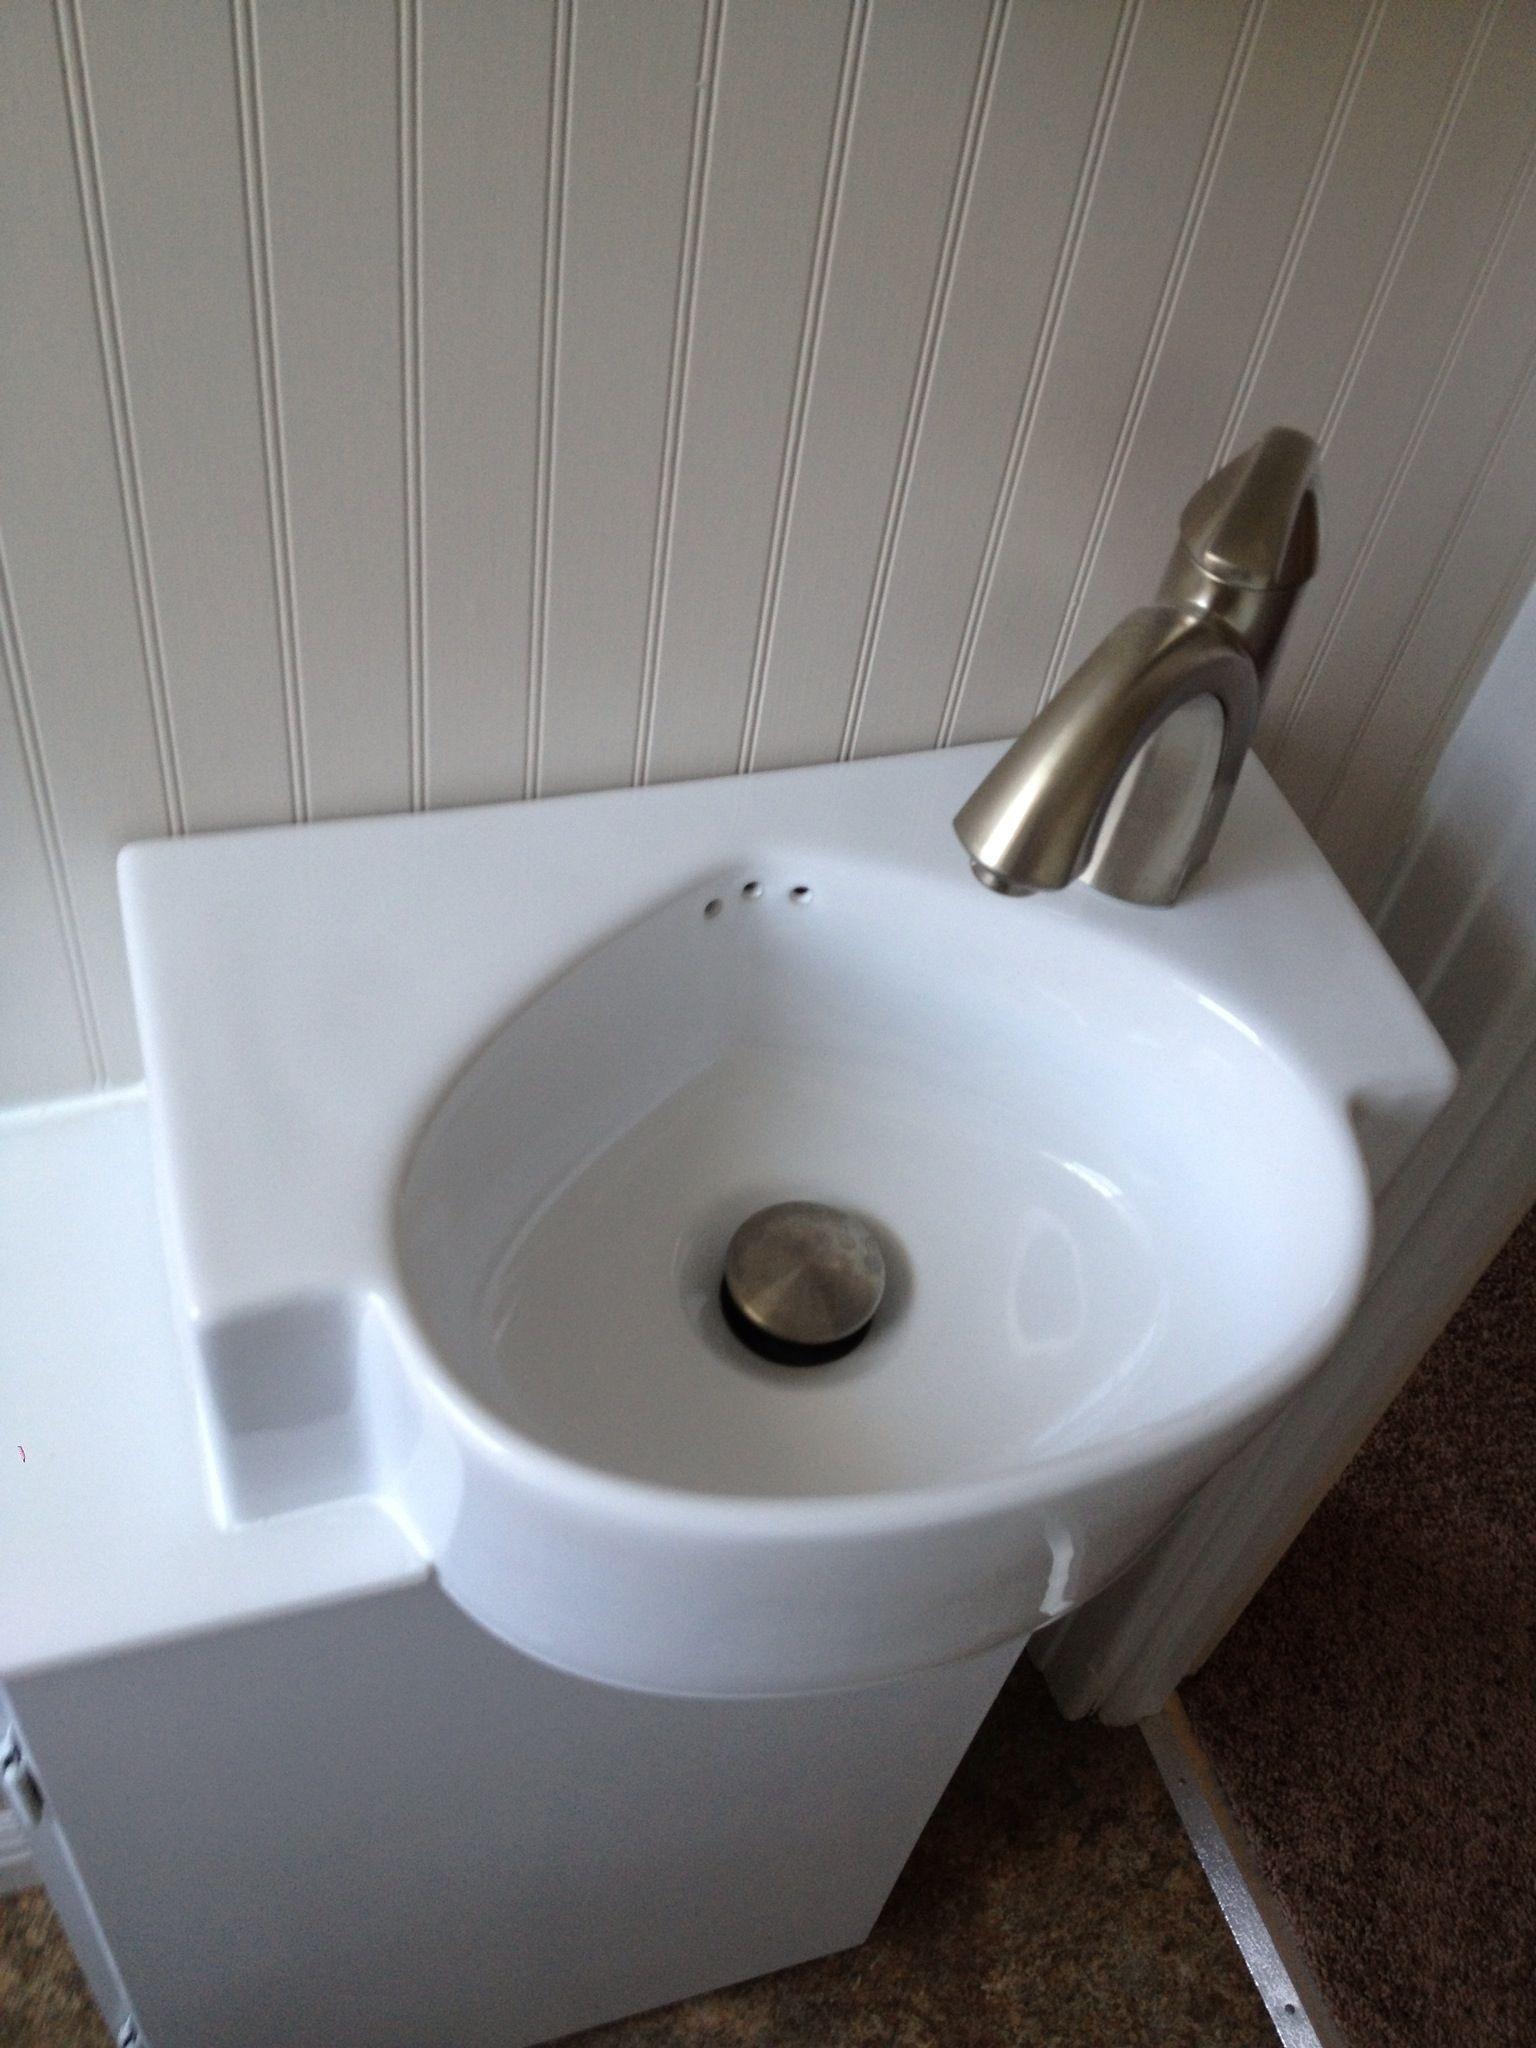 Tiny bathroom sinks